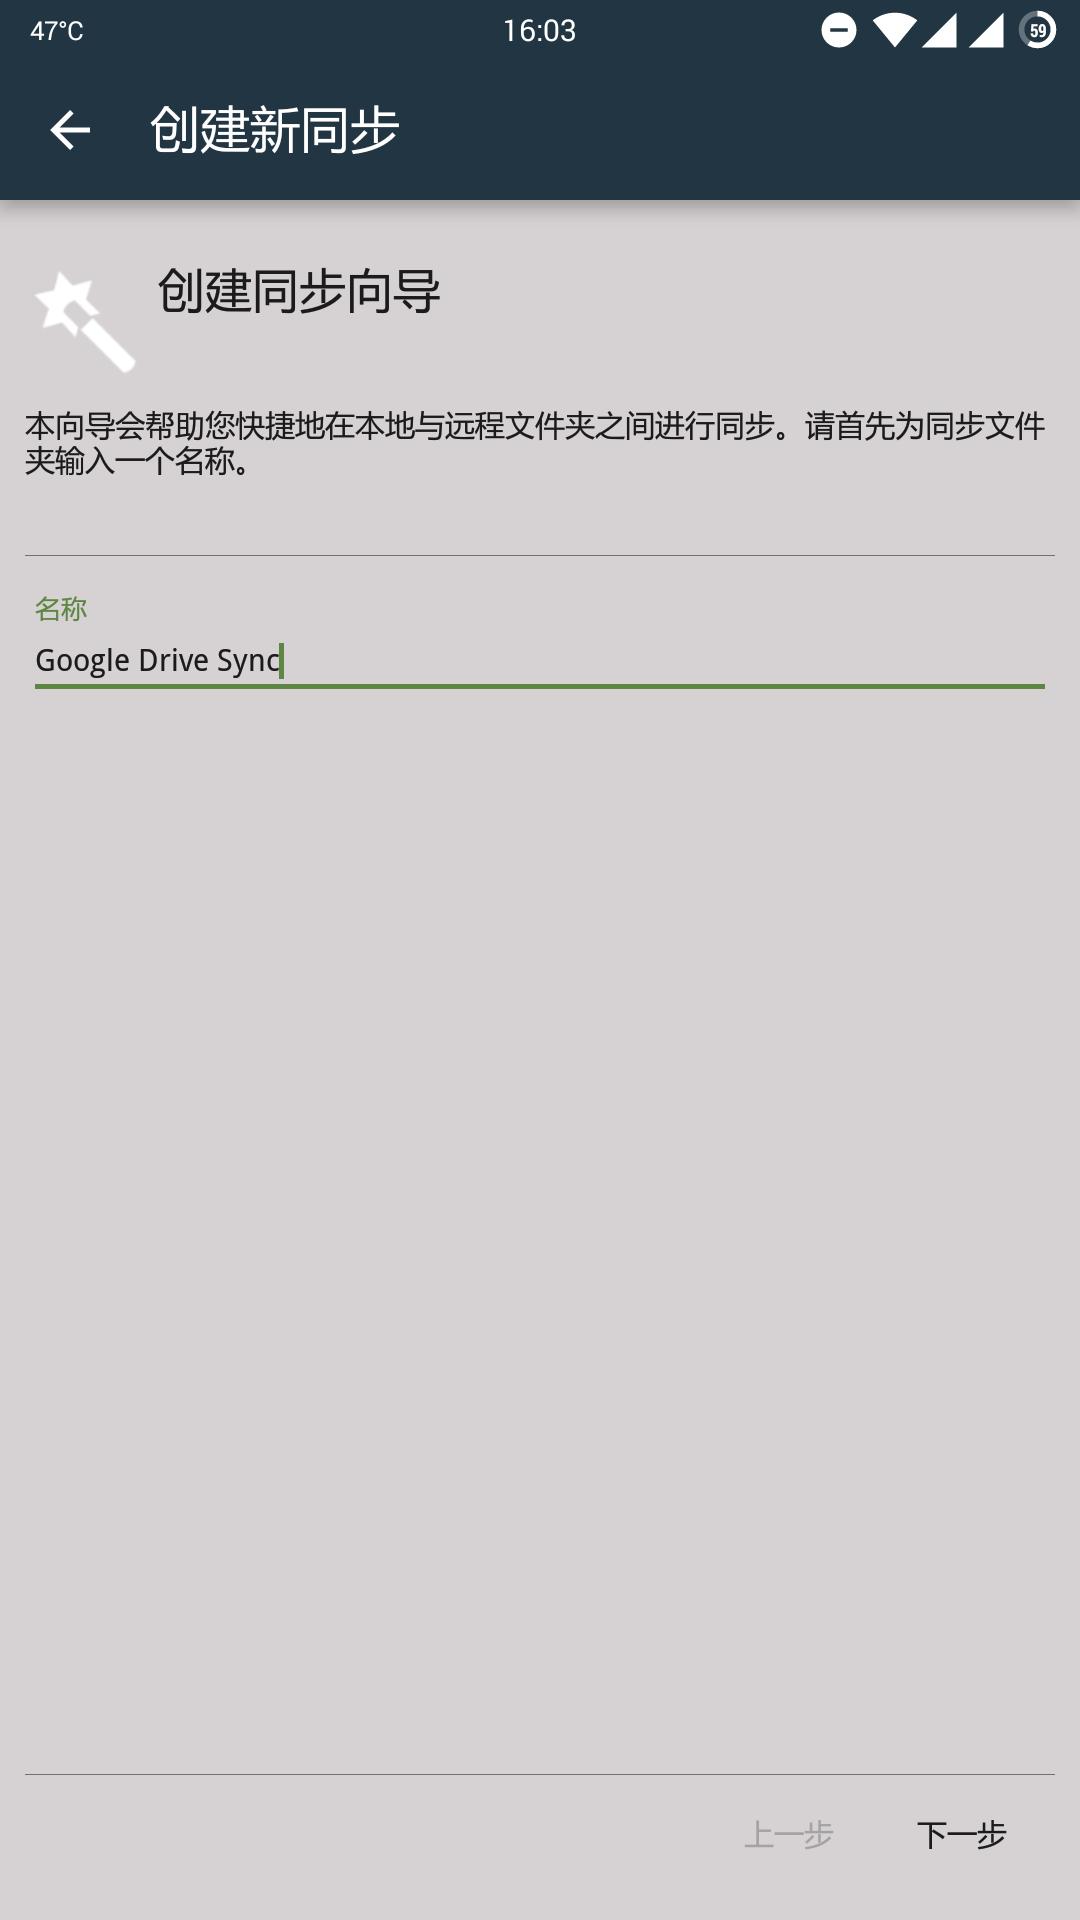 Screenshot_20161205-160306.png